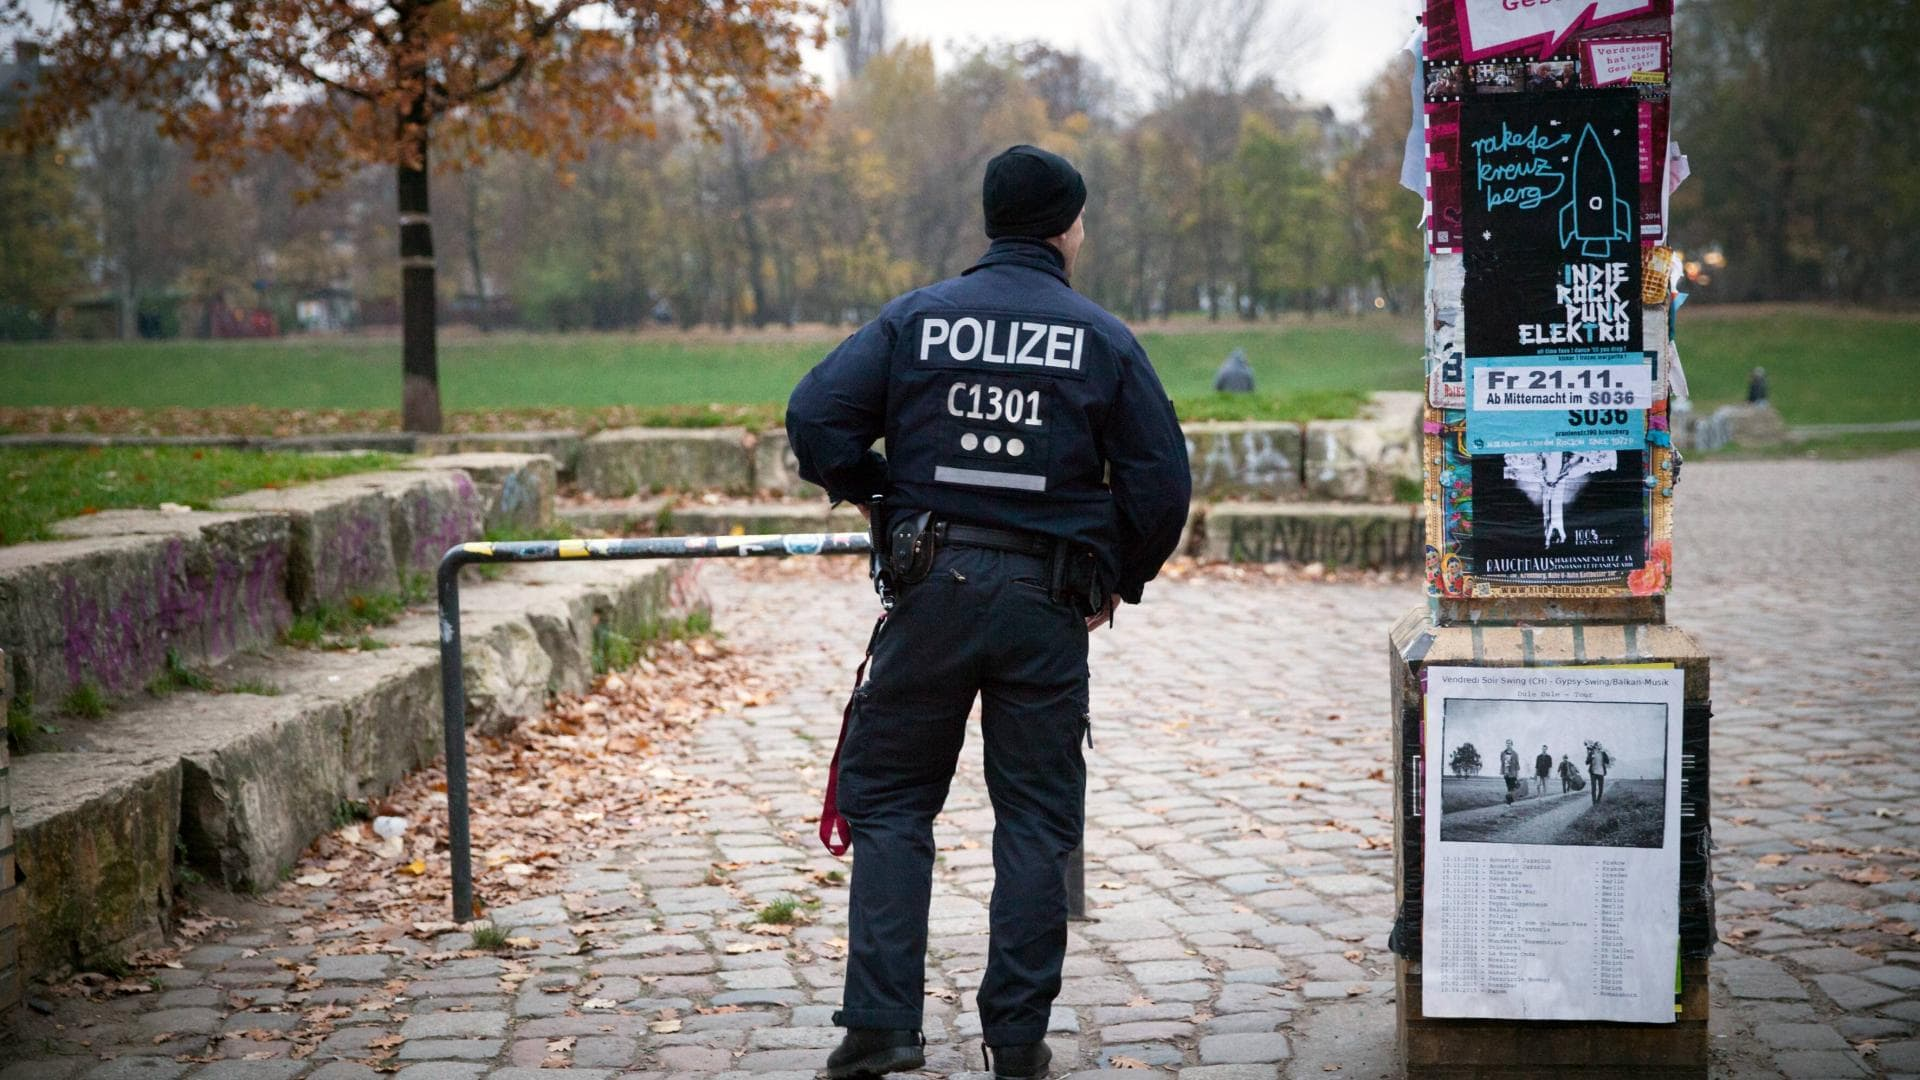 polizist görli berlin